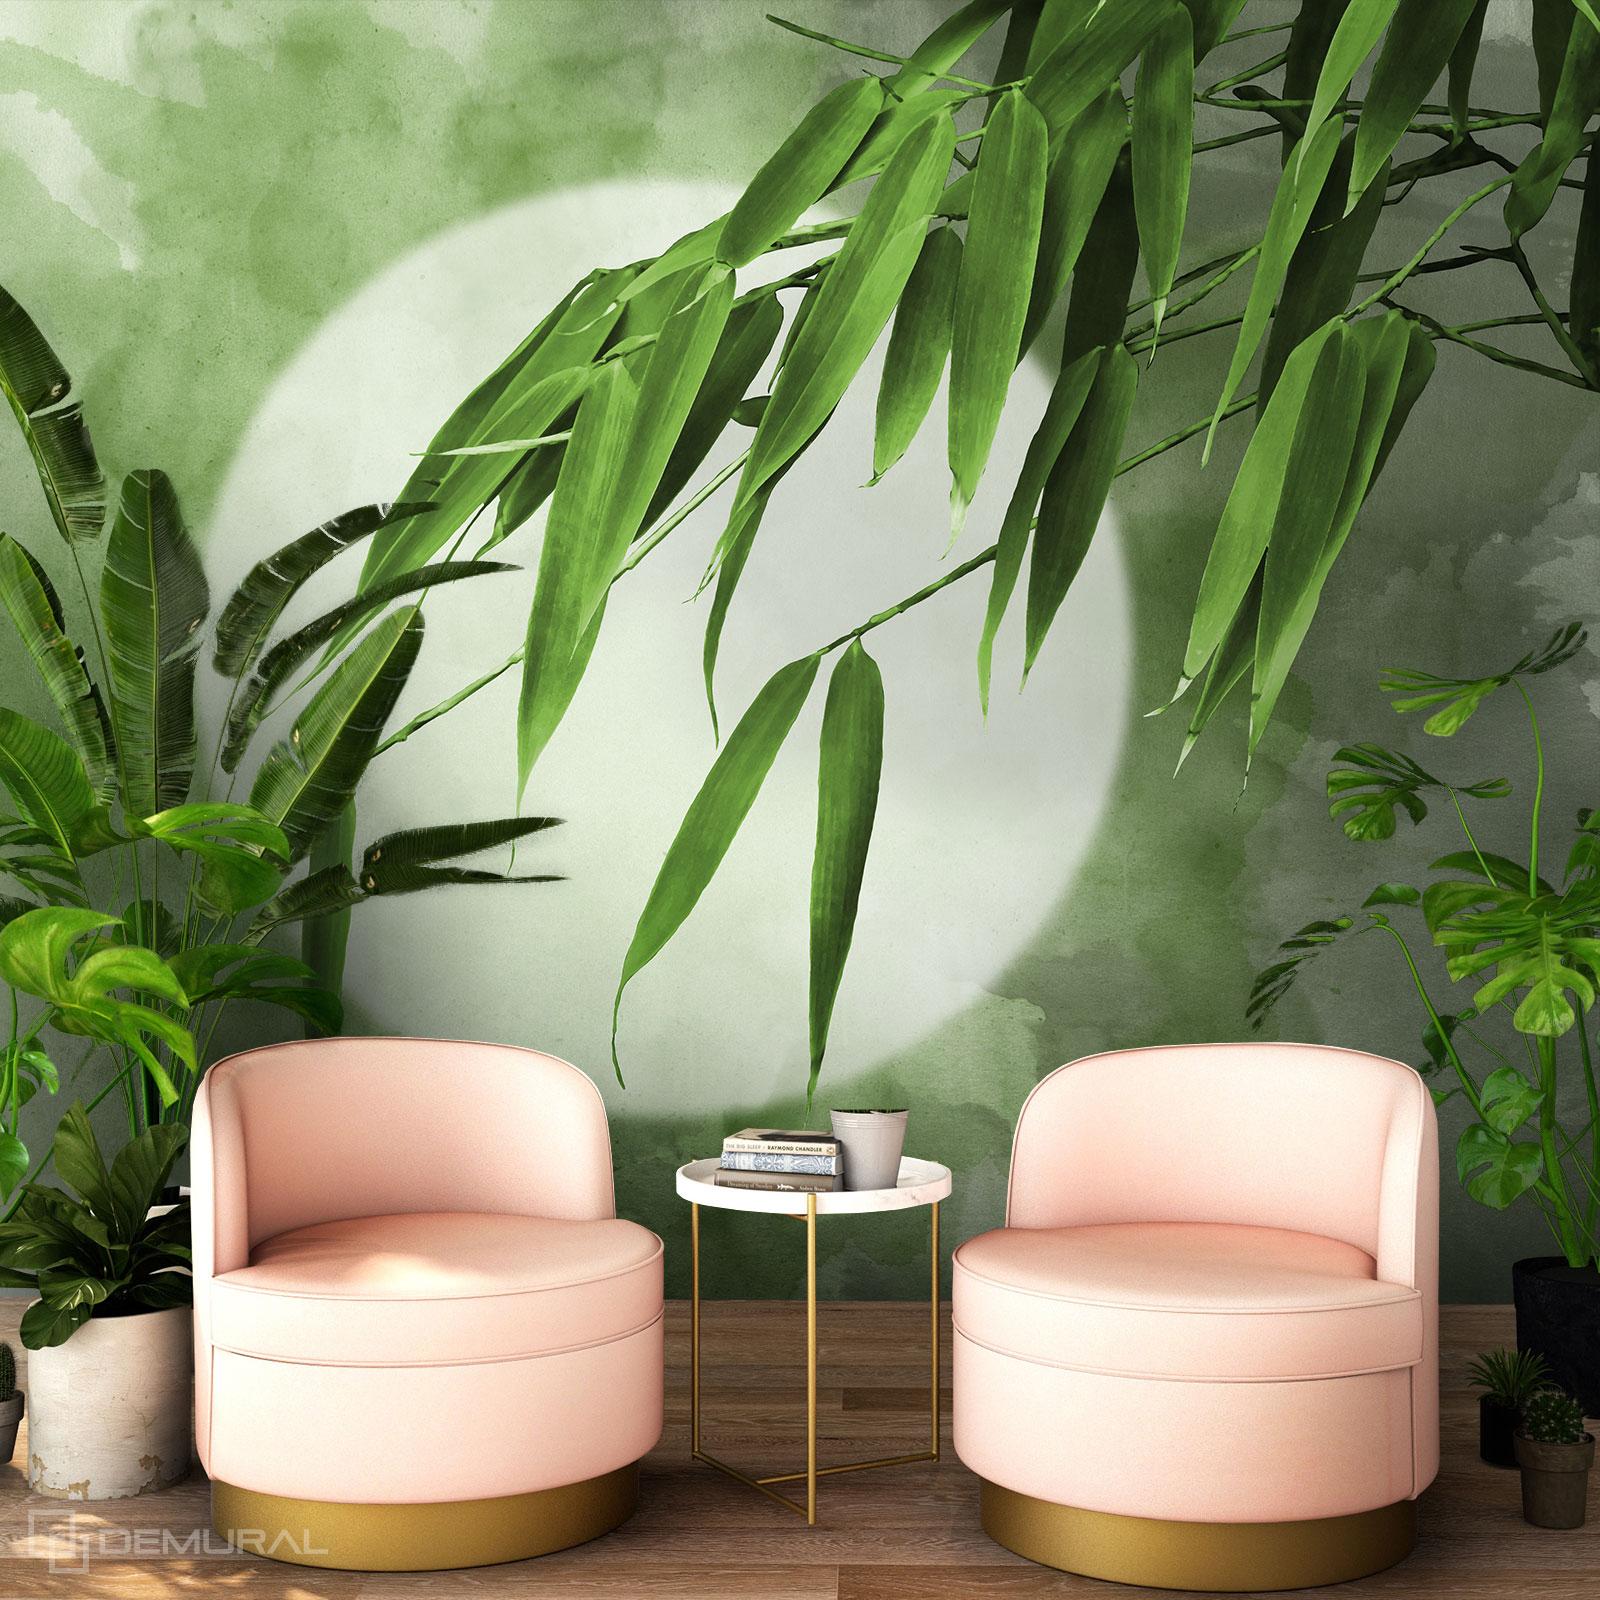 Fototapete Unter den Bambusblättern - Fototapete bambus